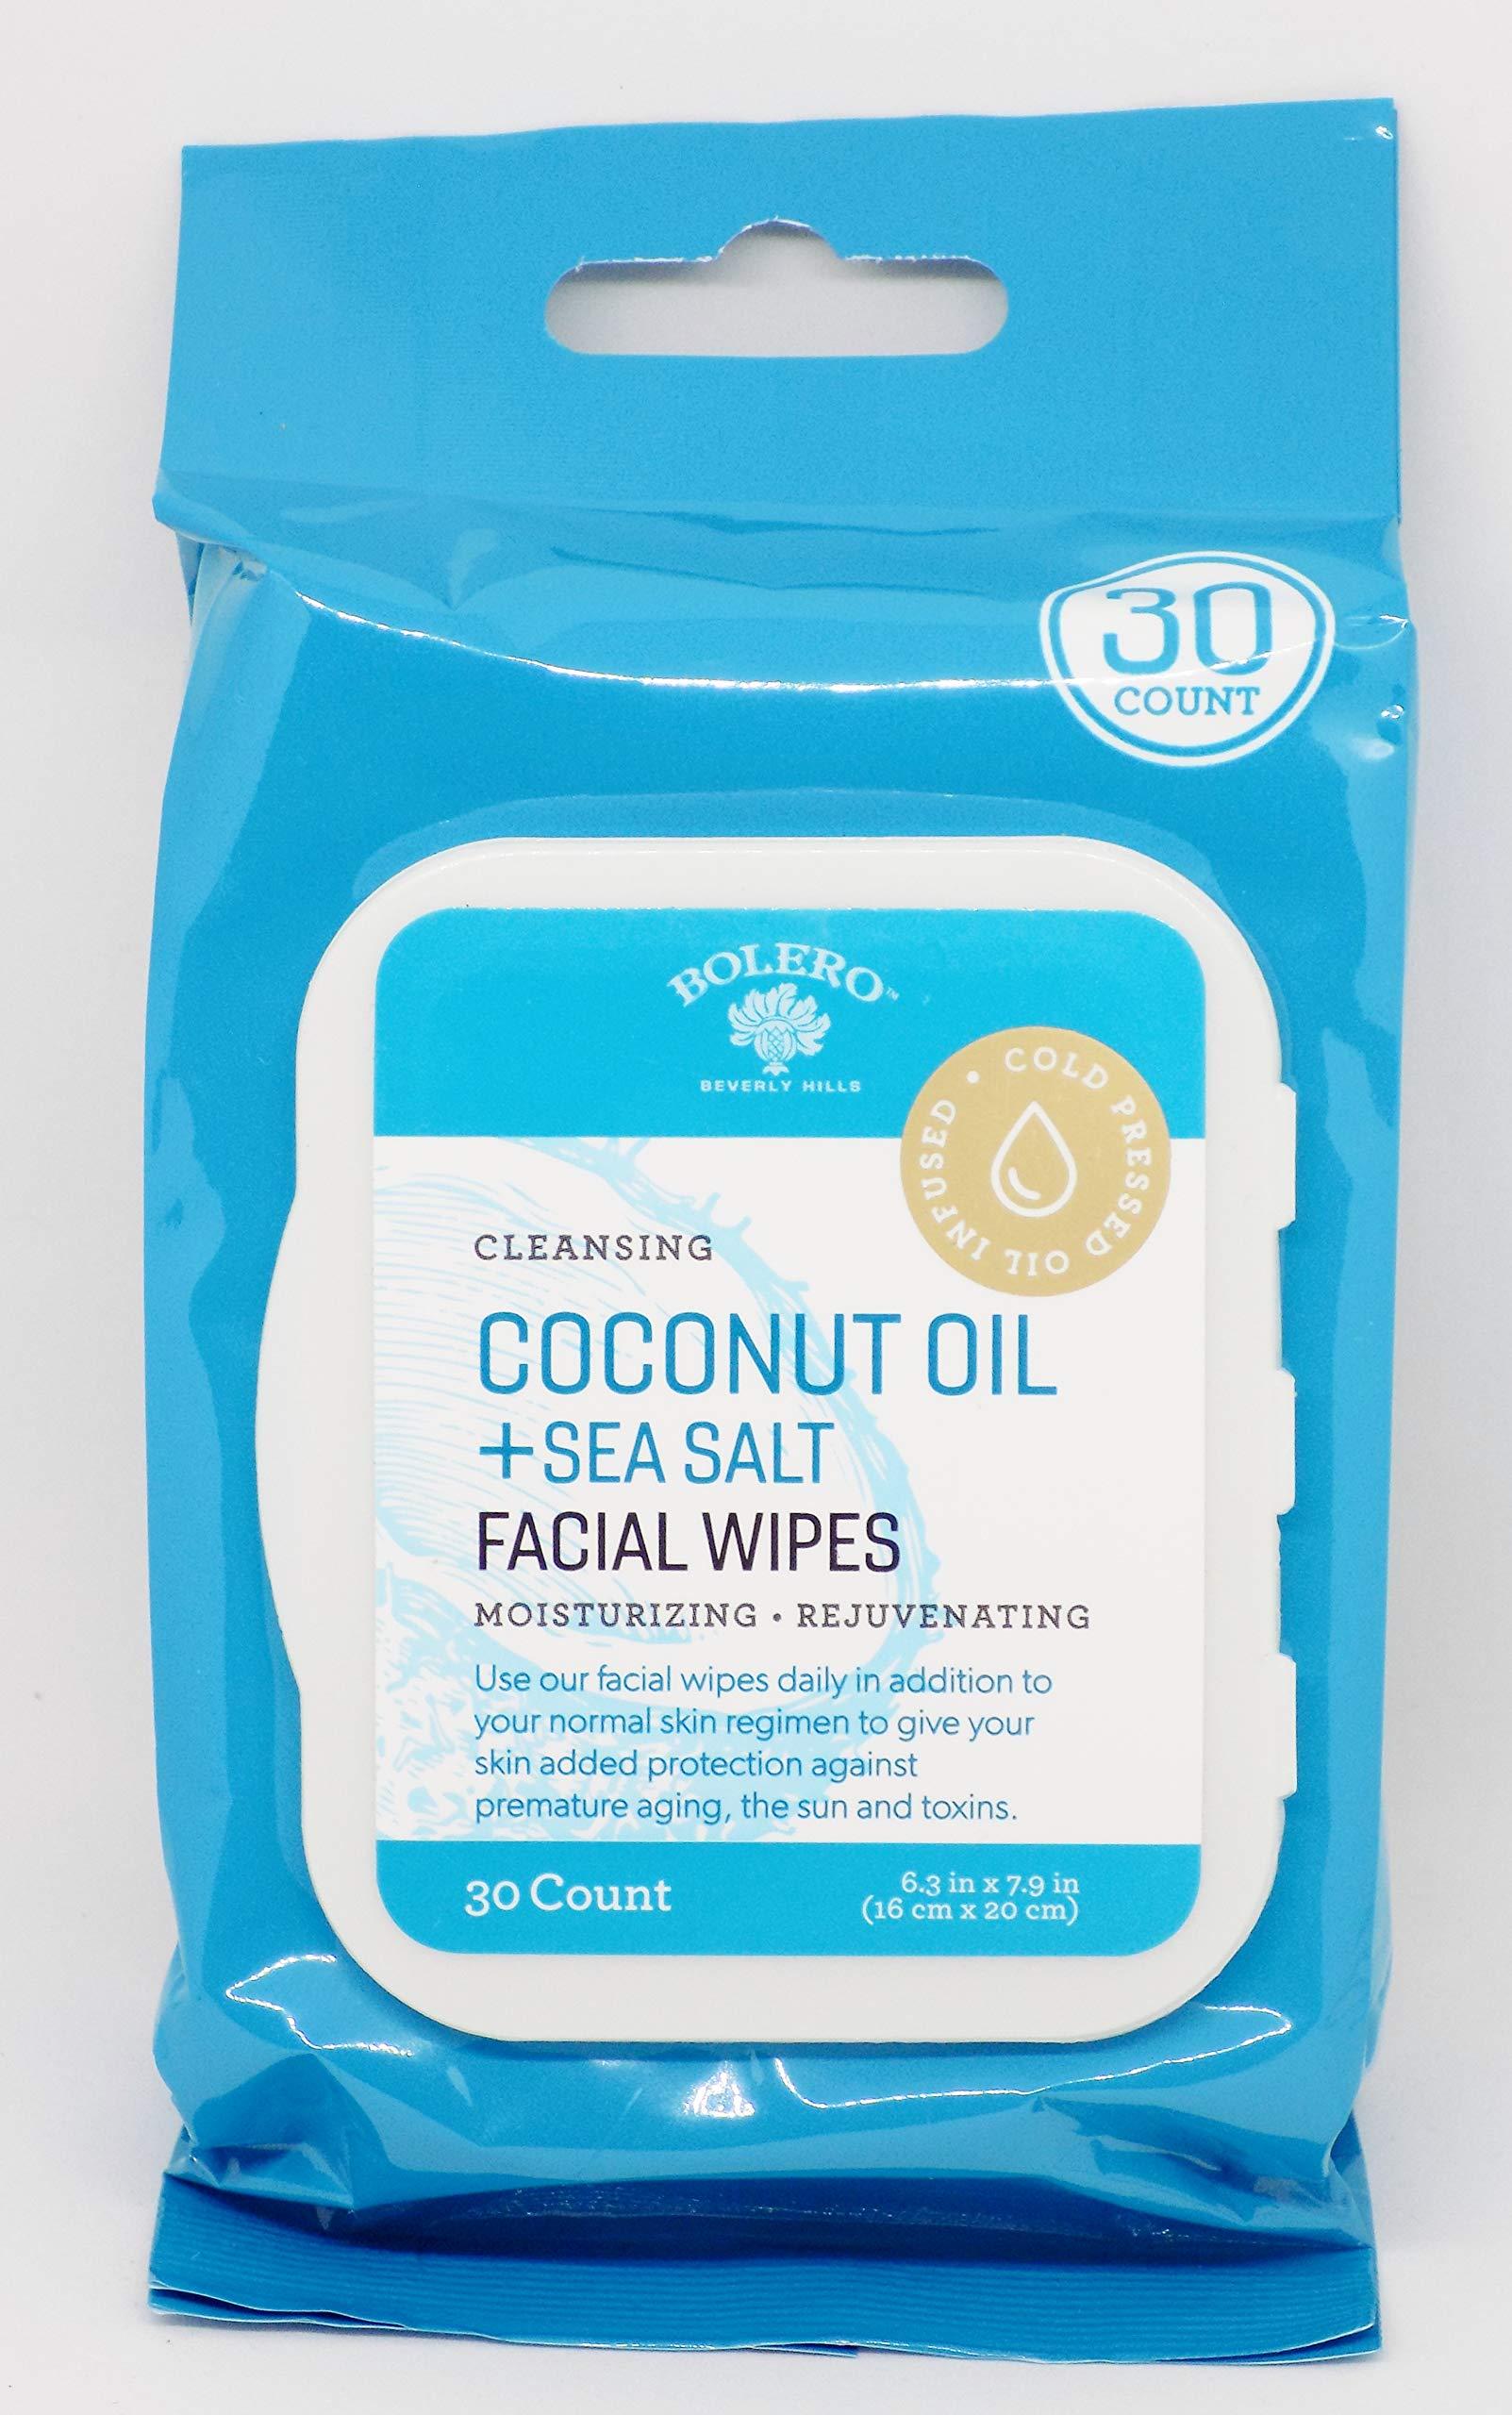 Bolero - Bolero Coconut Oil + Sea Salt Facial Wipes